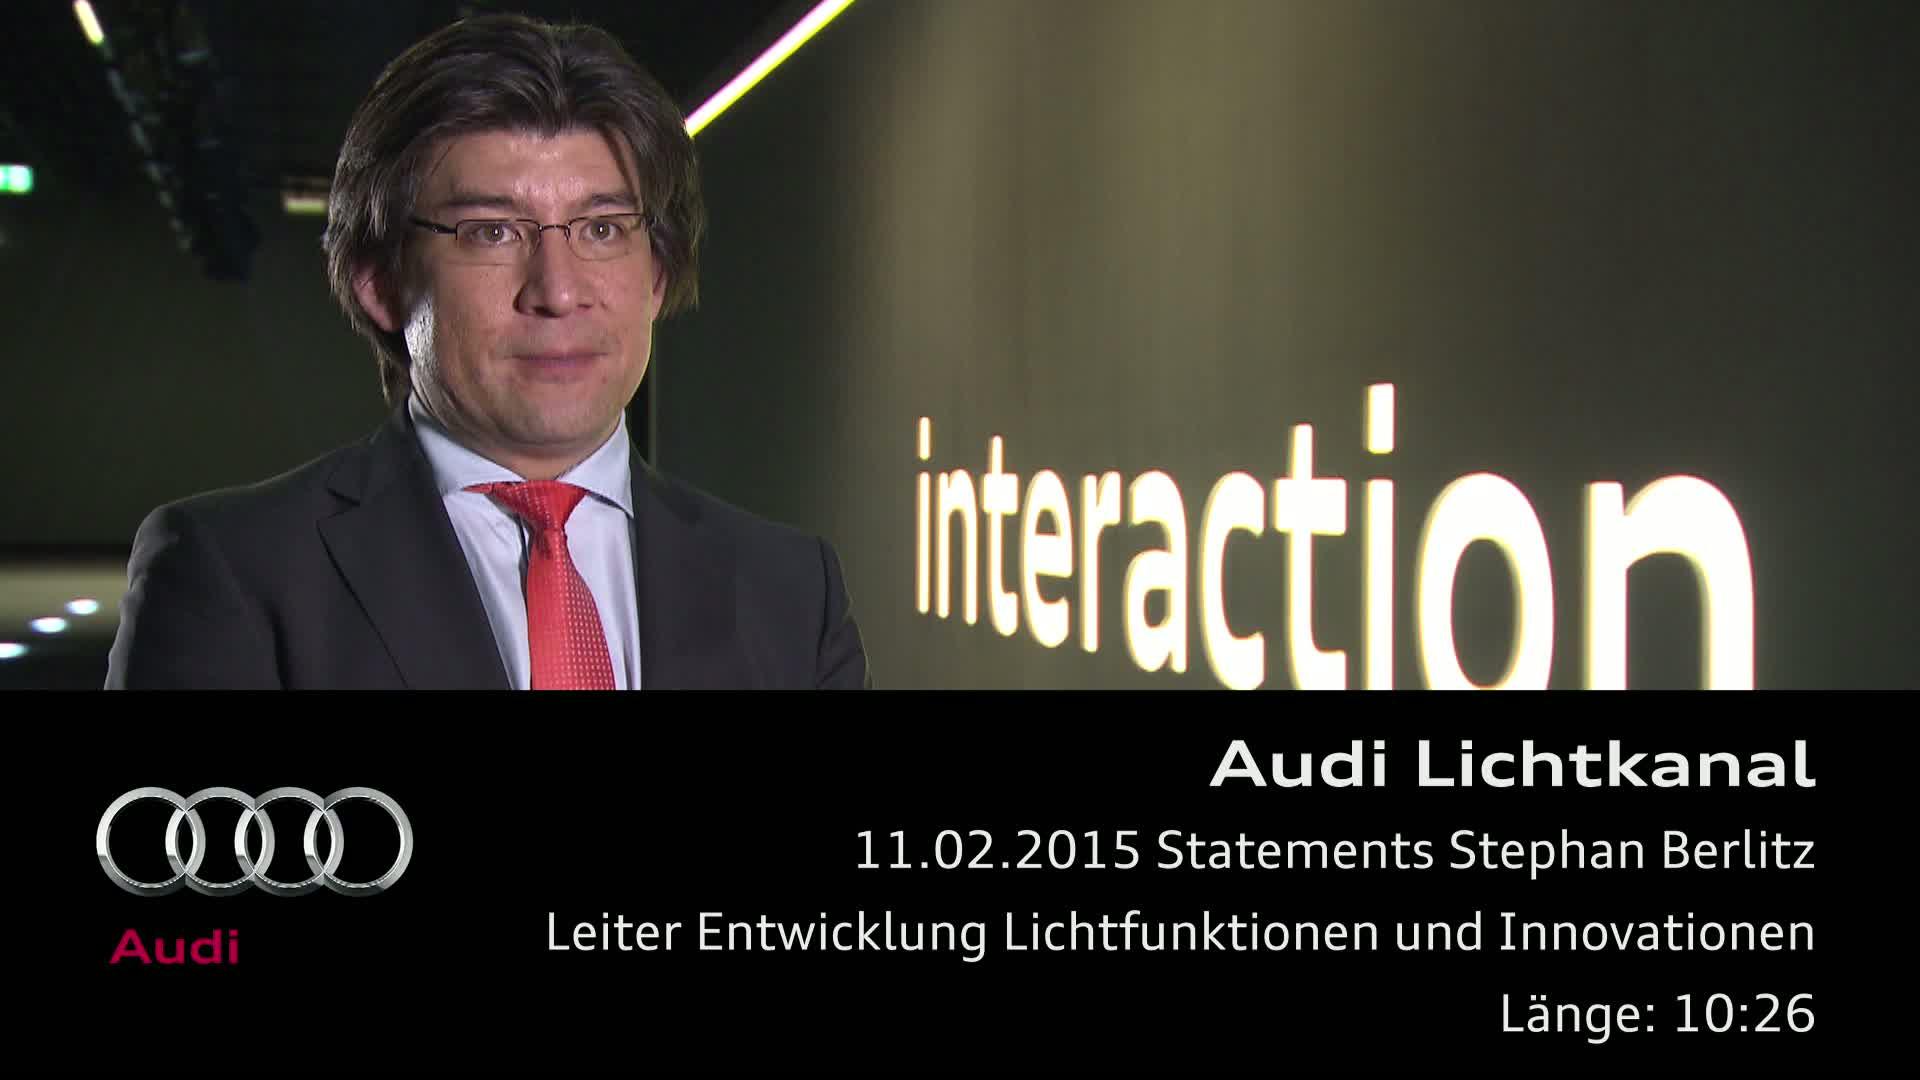 Audi Lichtkanal - Statement Stephan Berlitz